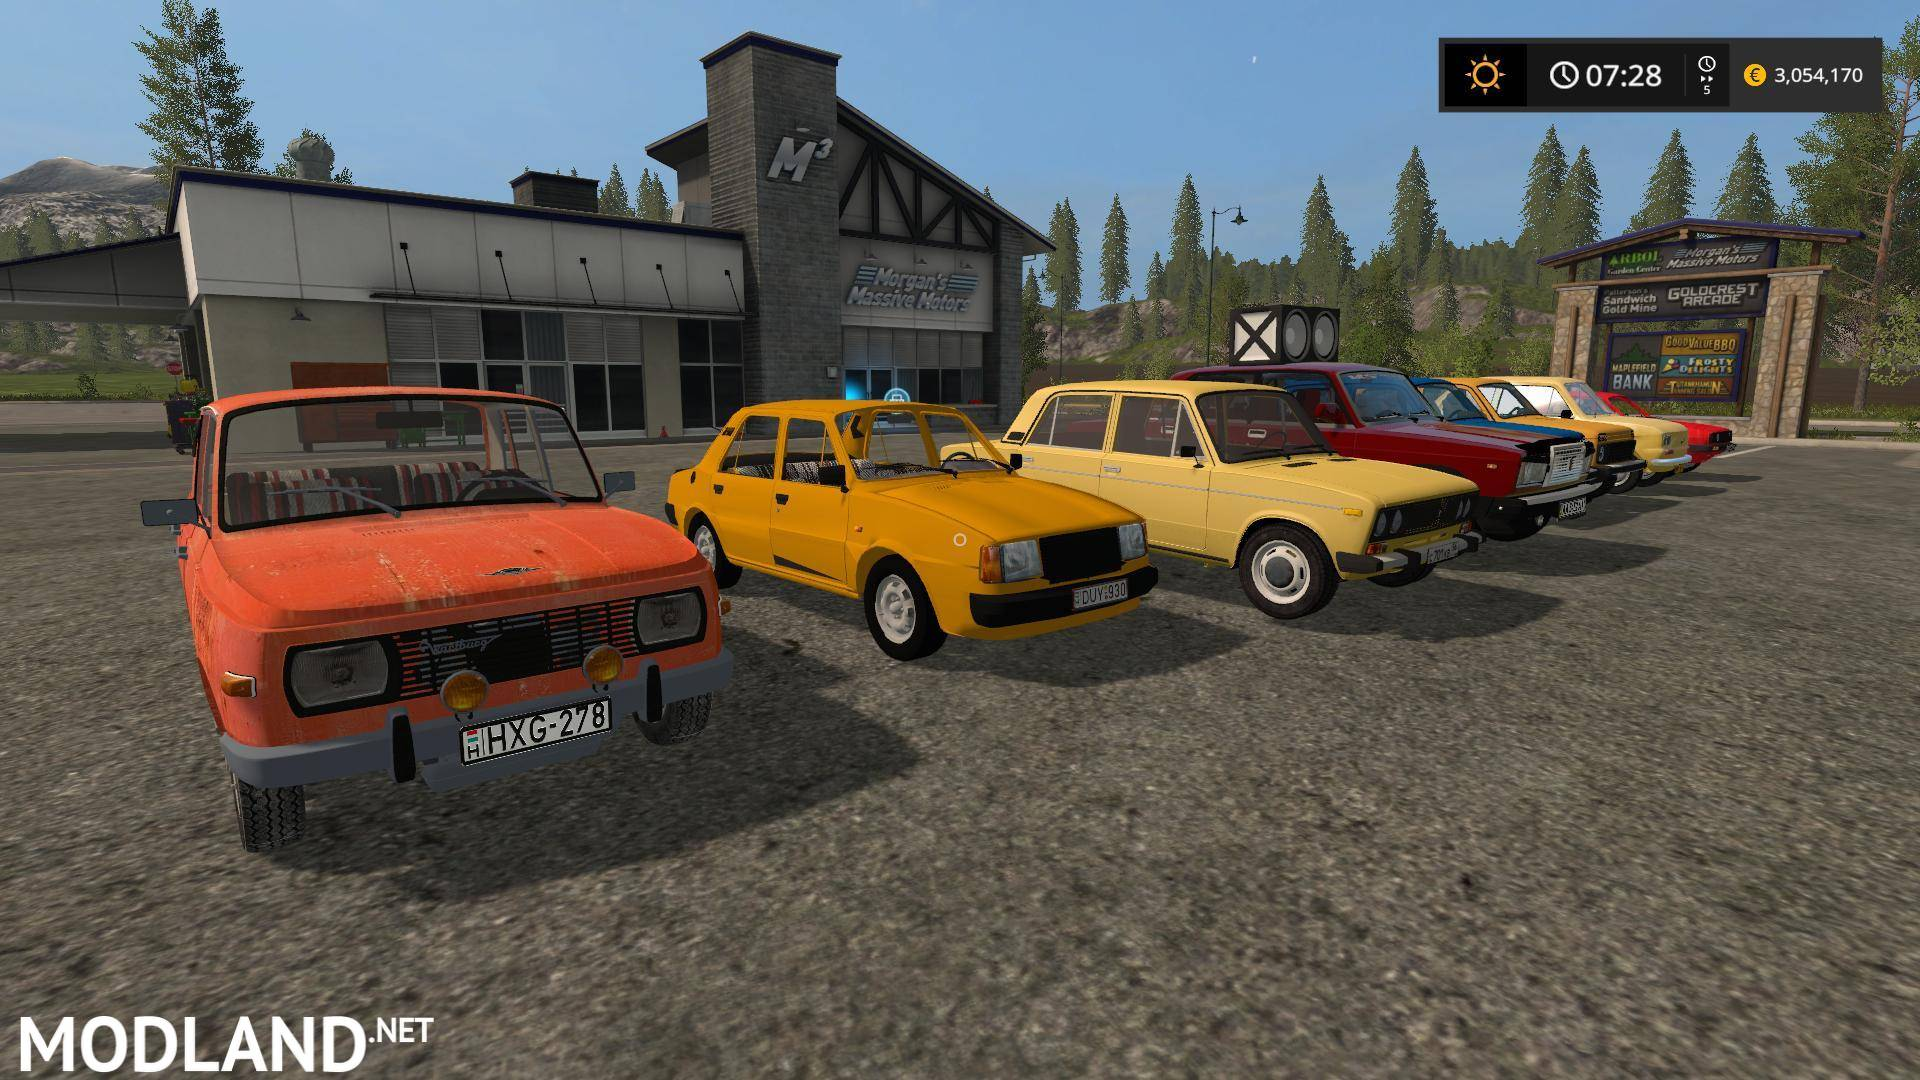 Old Car Pack v 1.0 mod Farming Simulator 17